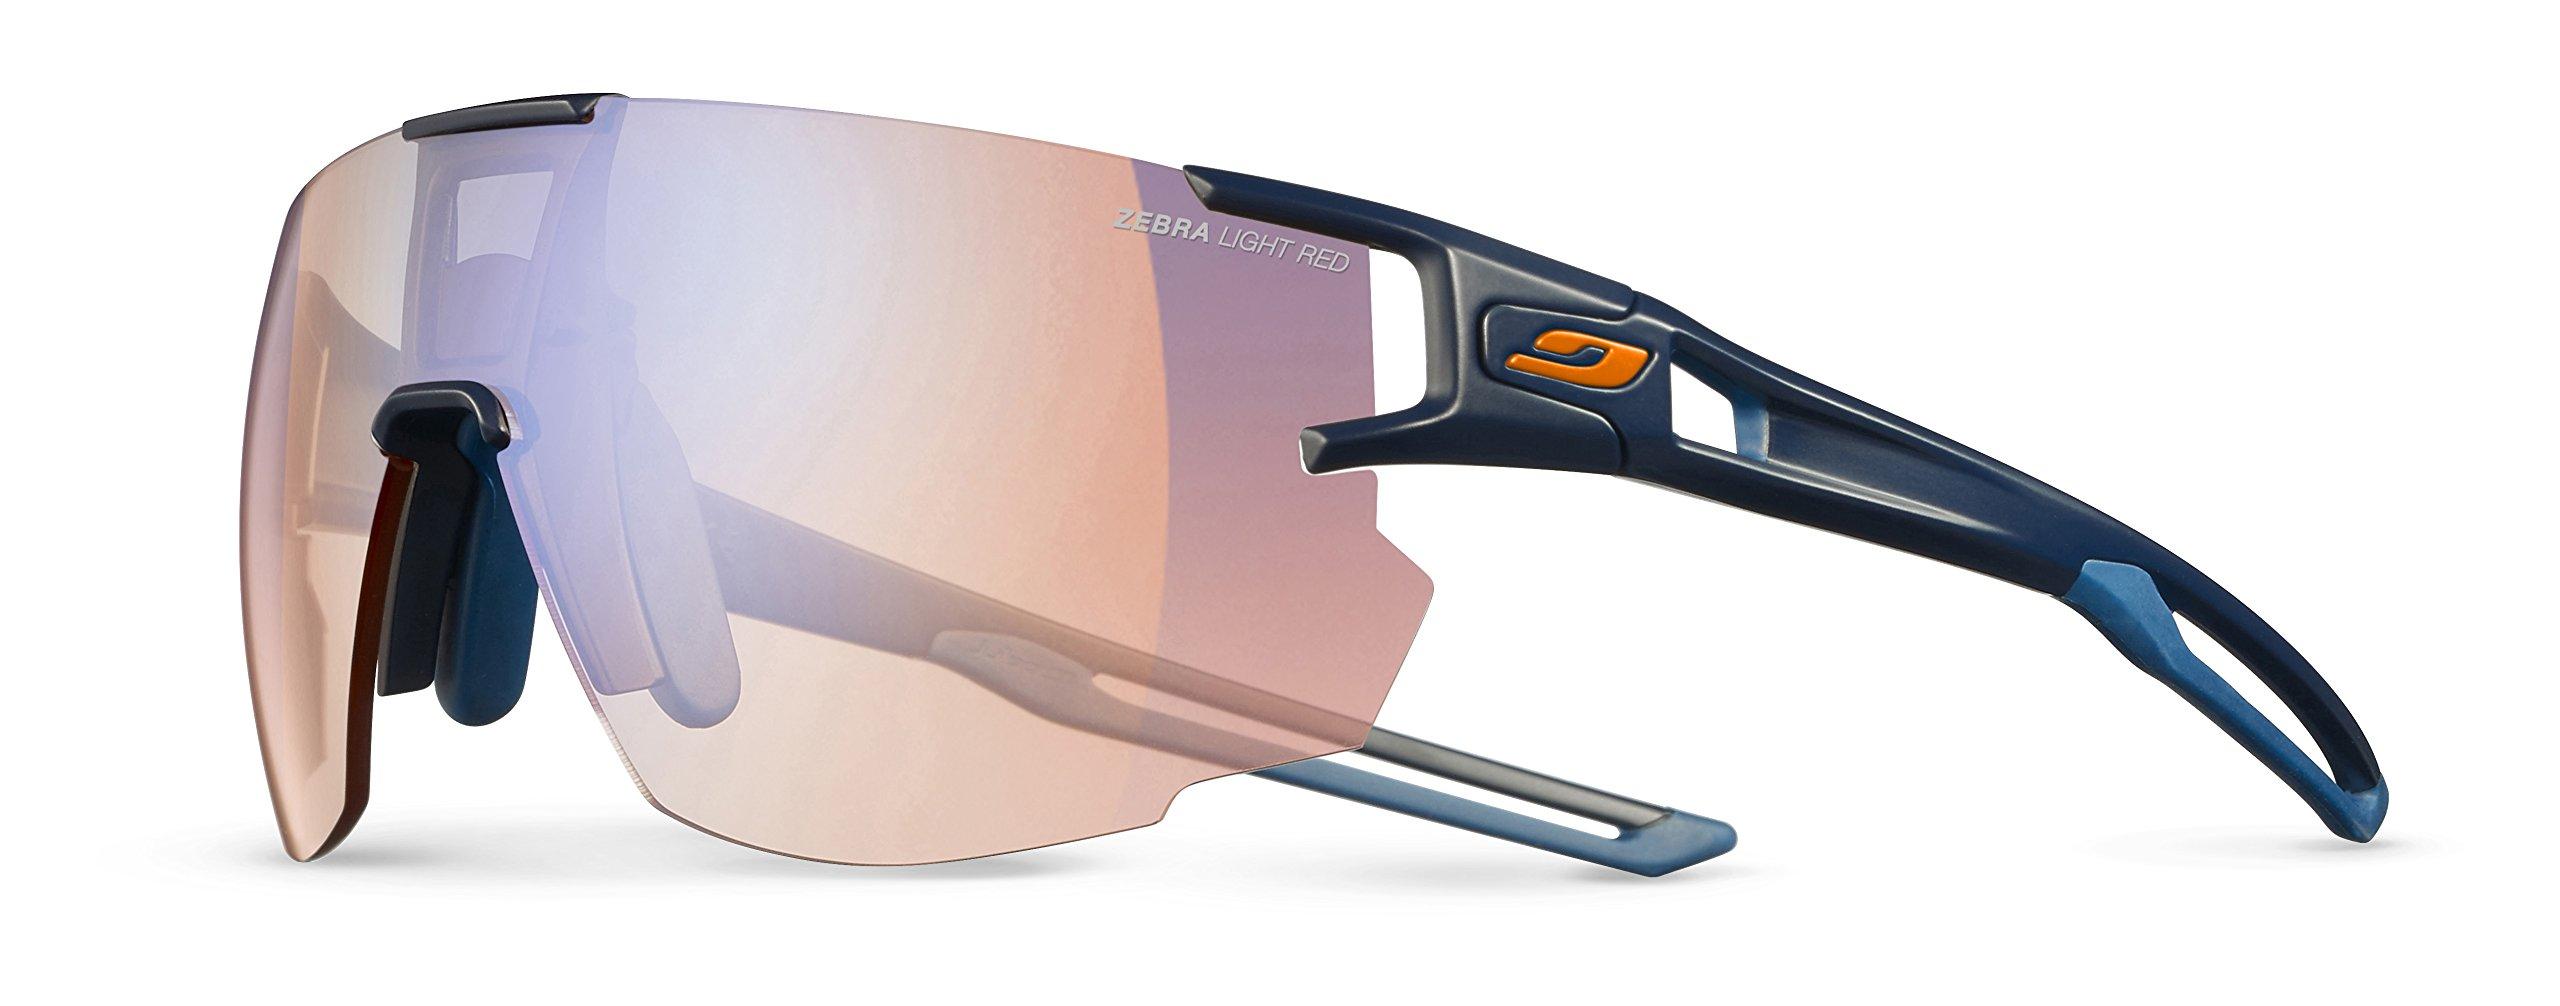 Julbo Aerospeed Sunglasses - Zebra Light Red - Dark Blue/Dark Blue/Orange